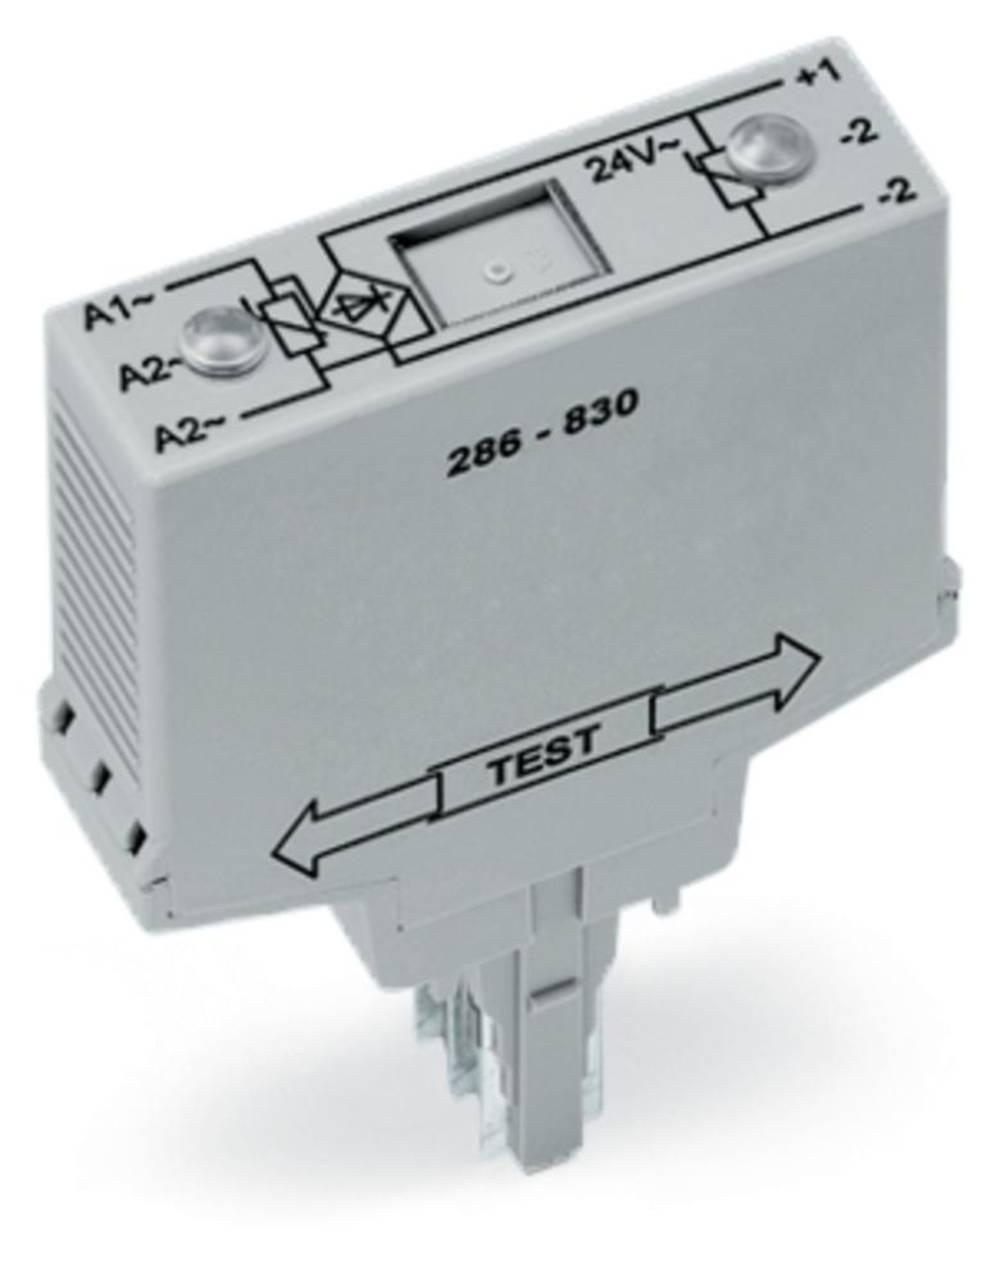 Broensretter komponent Med varistor 1 stk WAGO 286-840